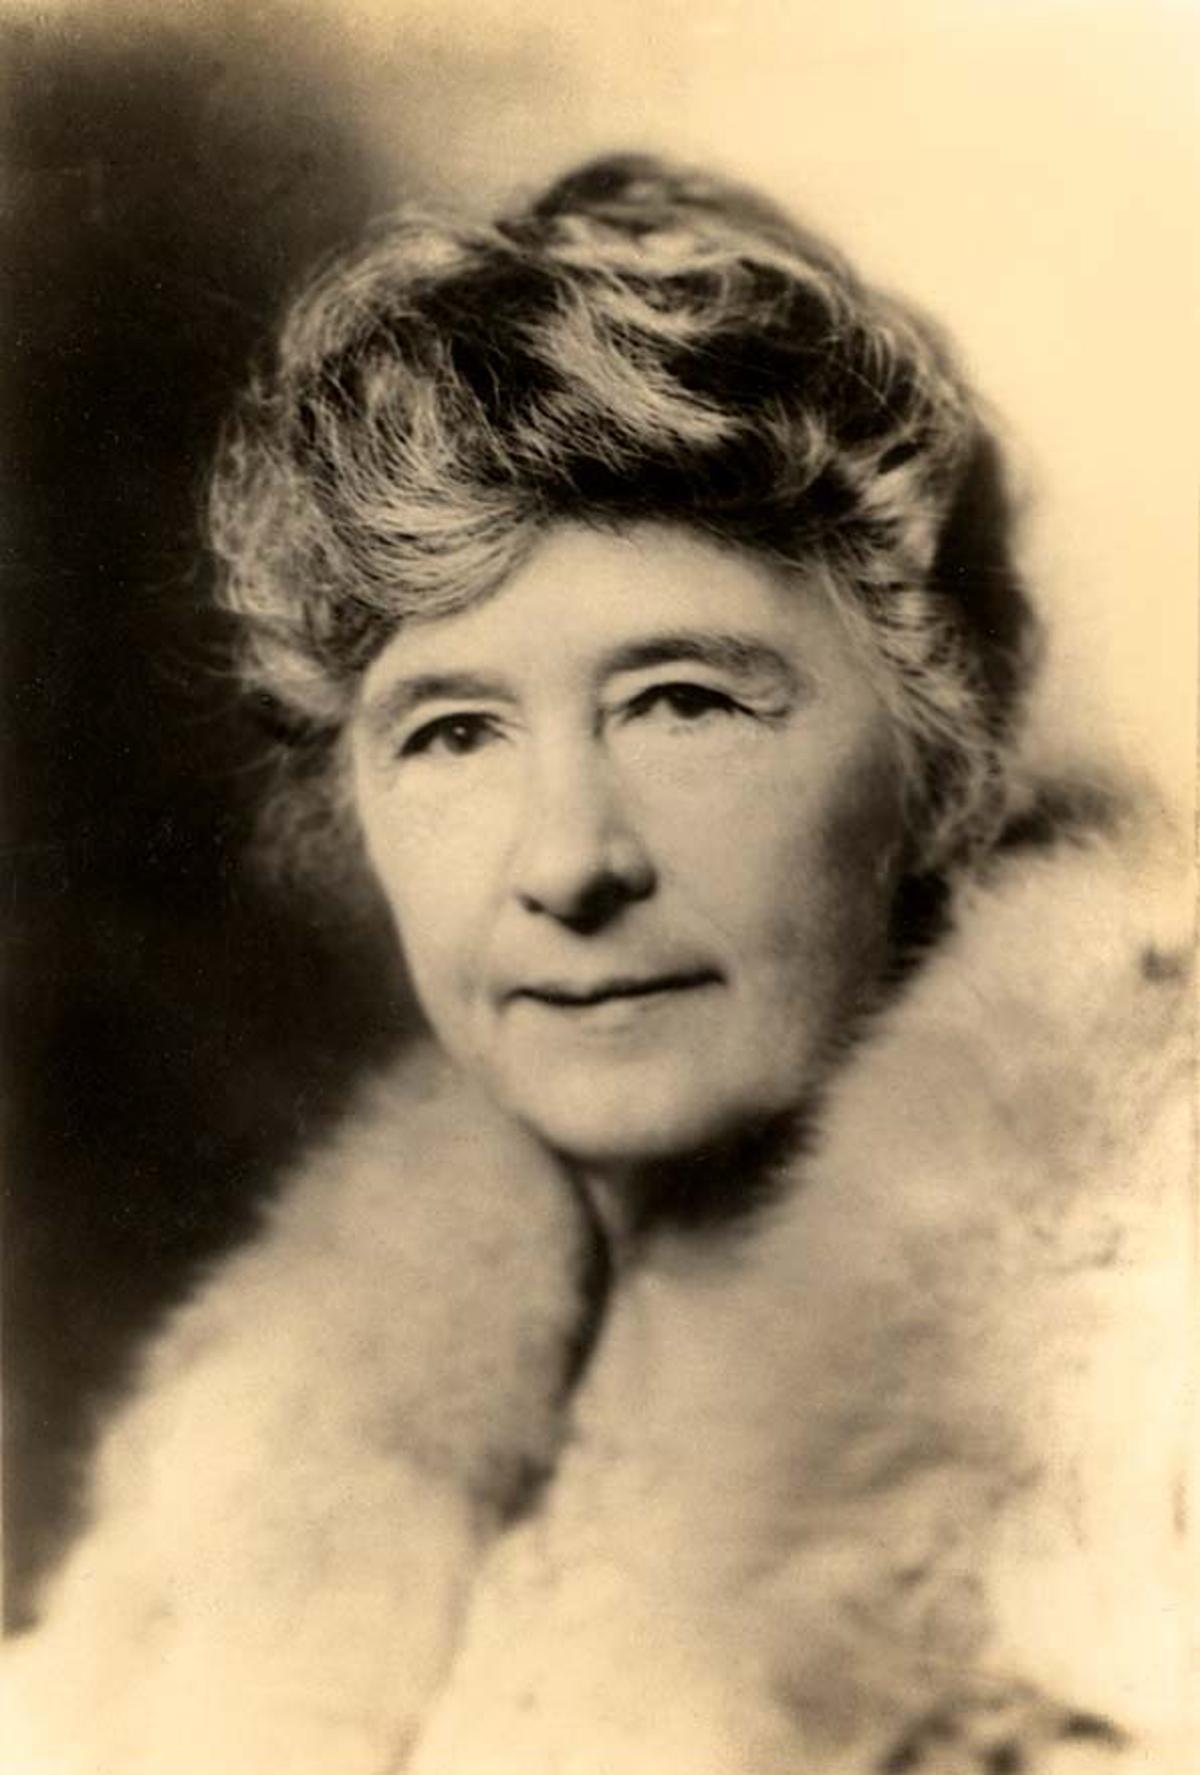 Adina De Zavala, c. 1910